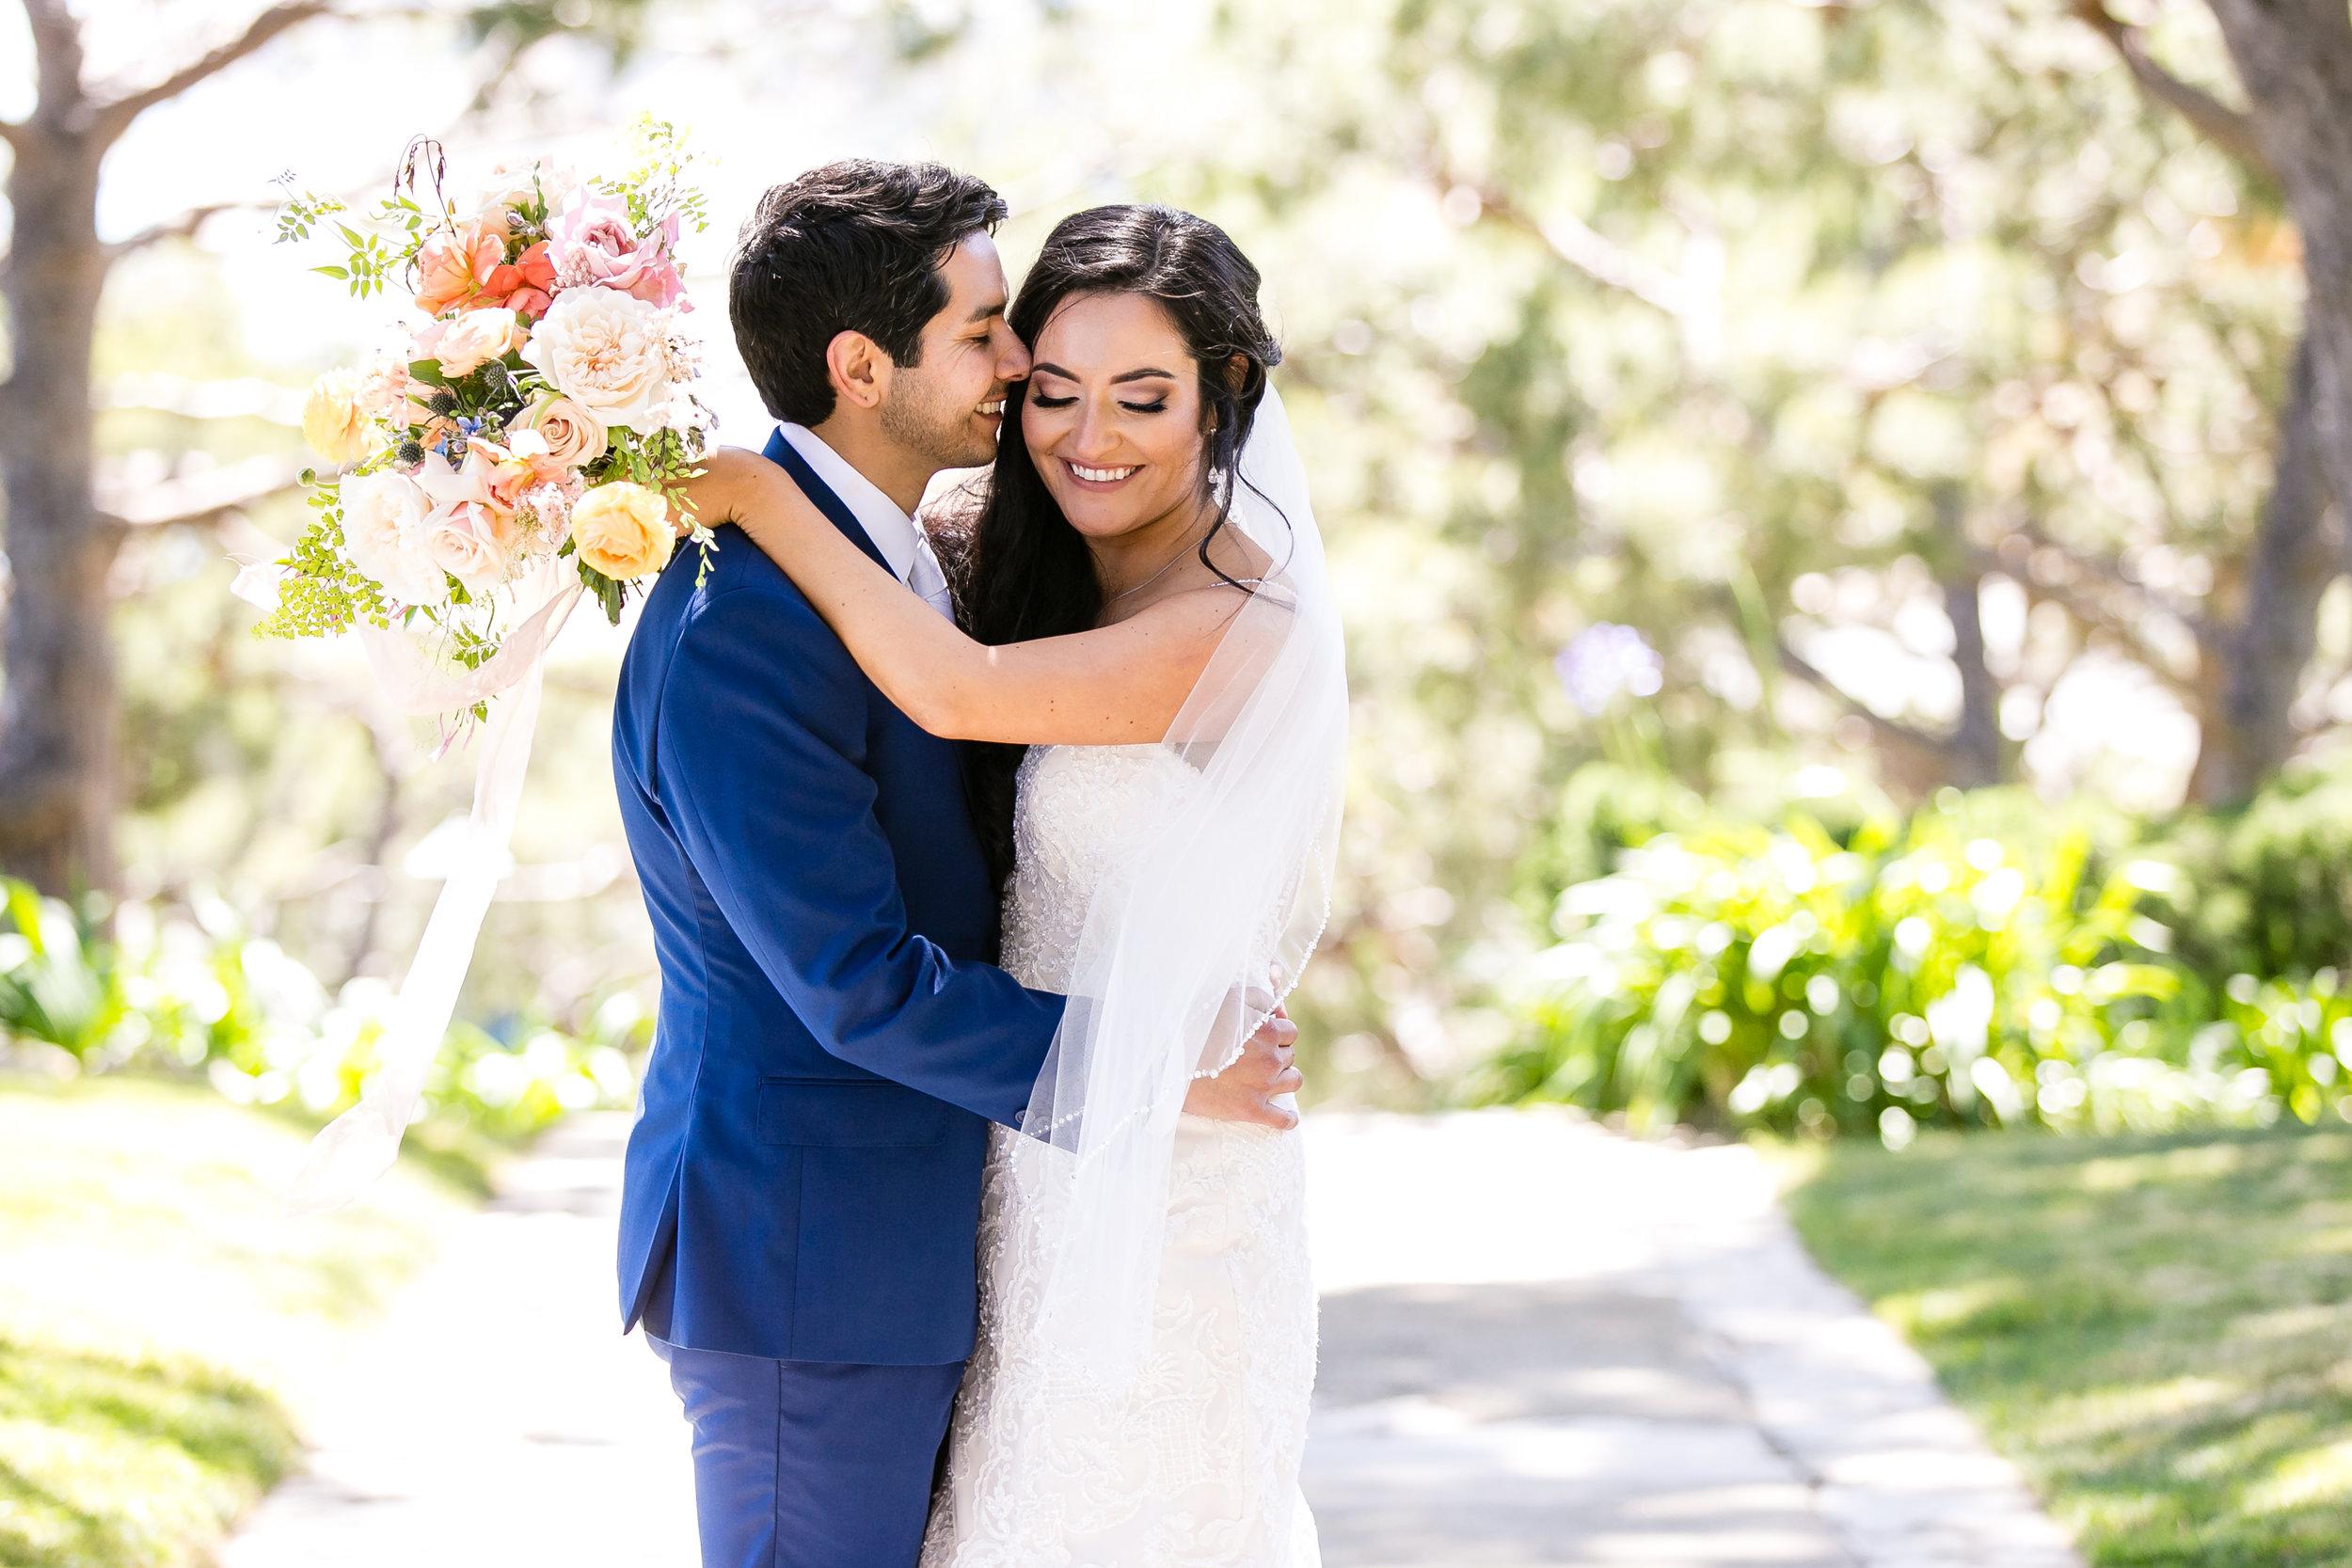 2019_05_24_Wedding_Barajas_0362.jpg